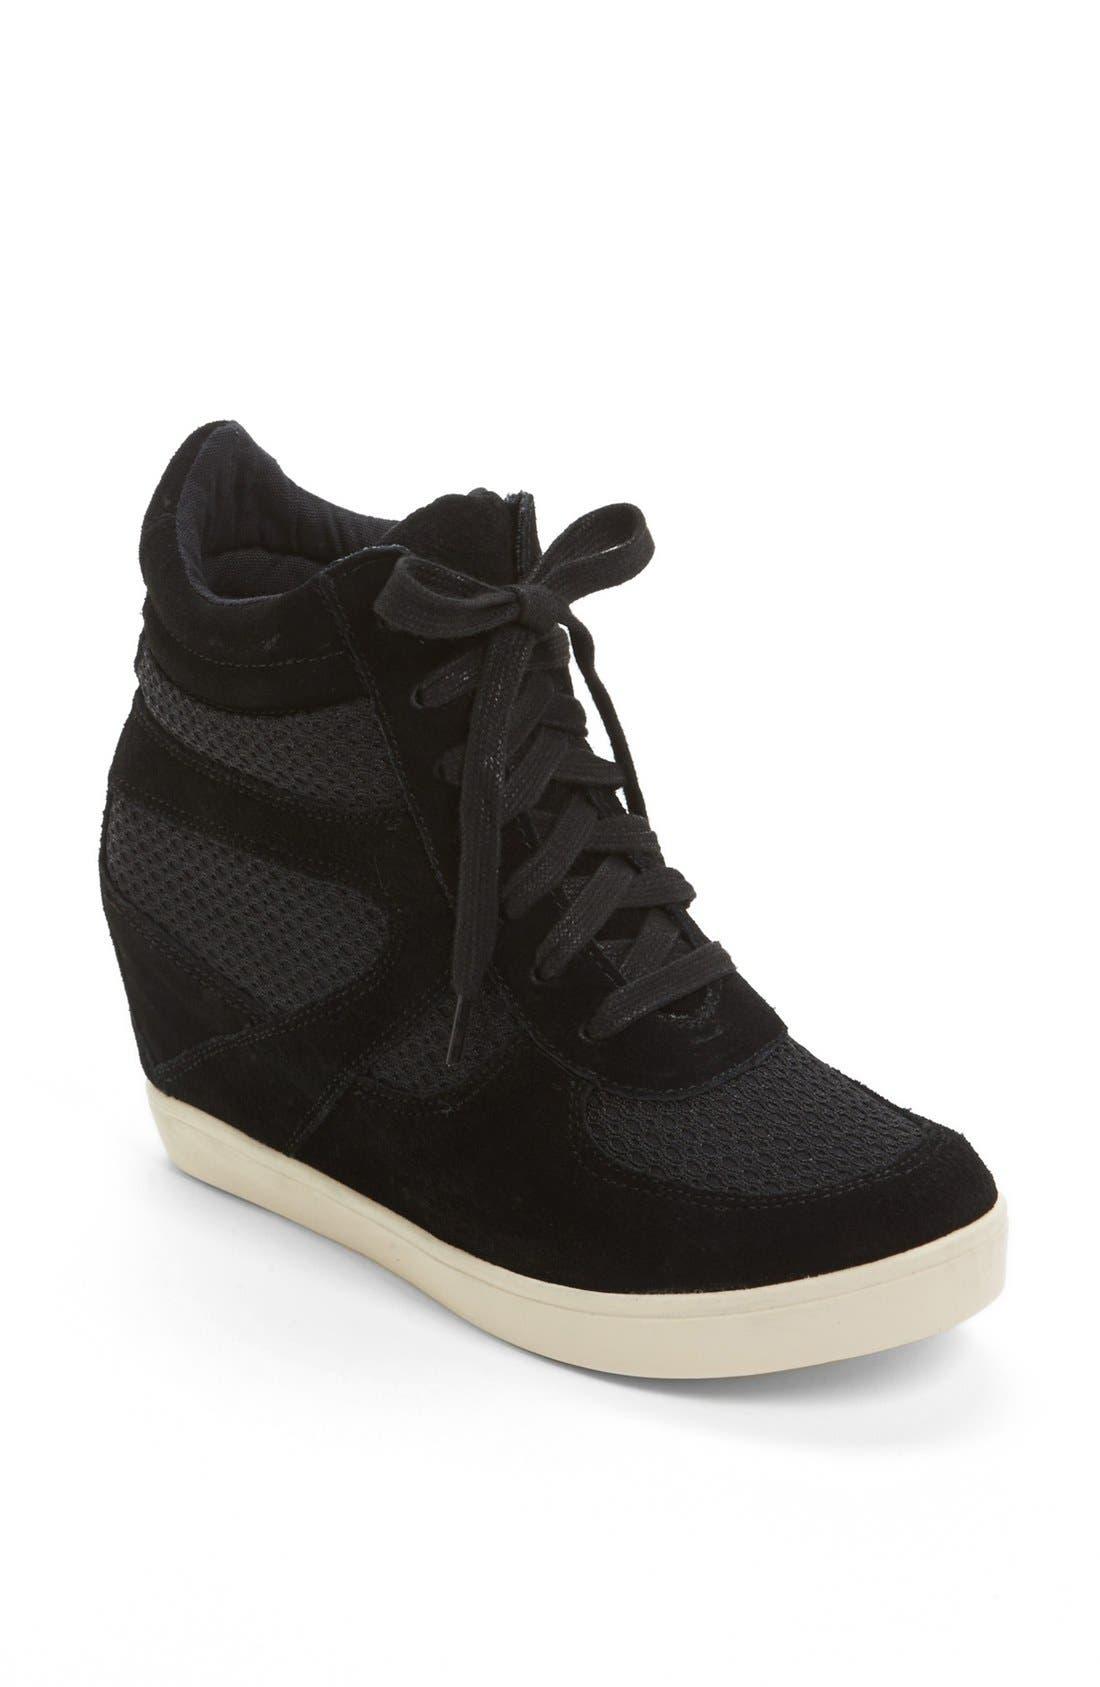 Alternate Image 1 Selected - Steve Madden 'Olympa-X' Wedge Sneaker